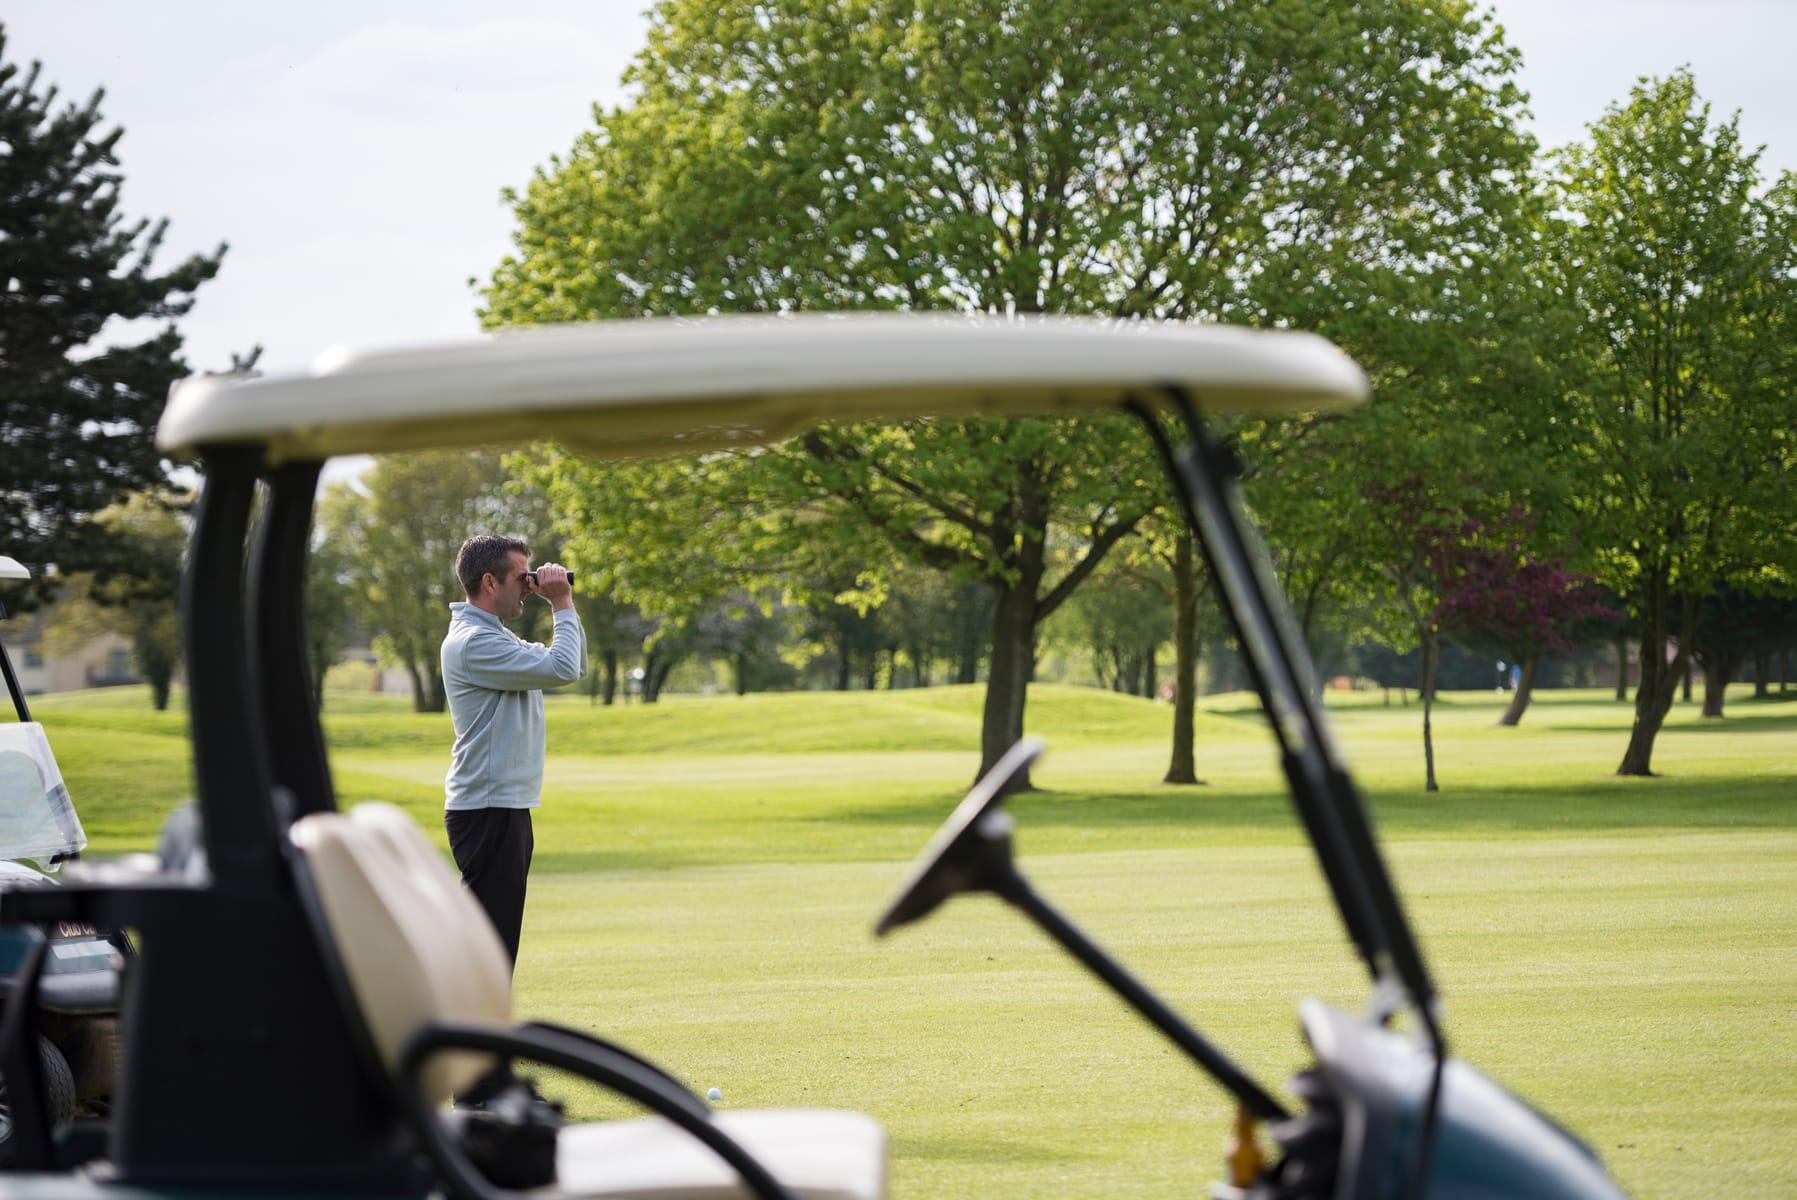 Golf Buggy, golf balls, golf pro bicester